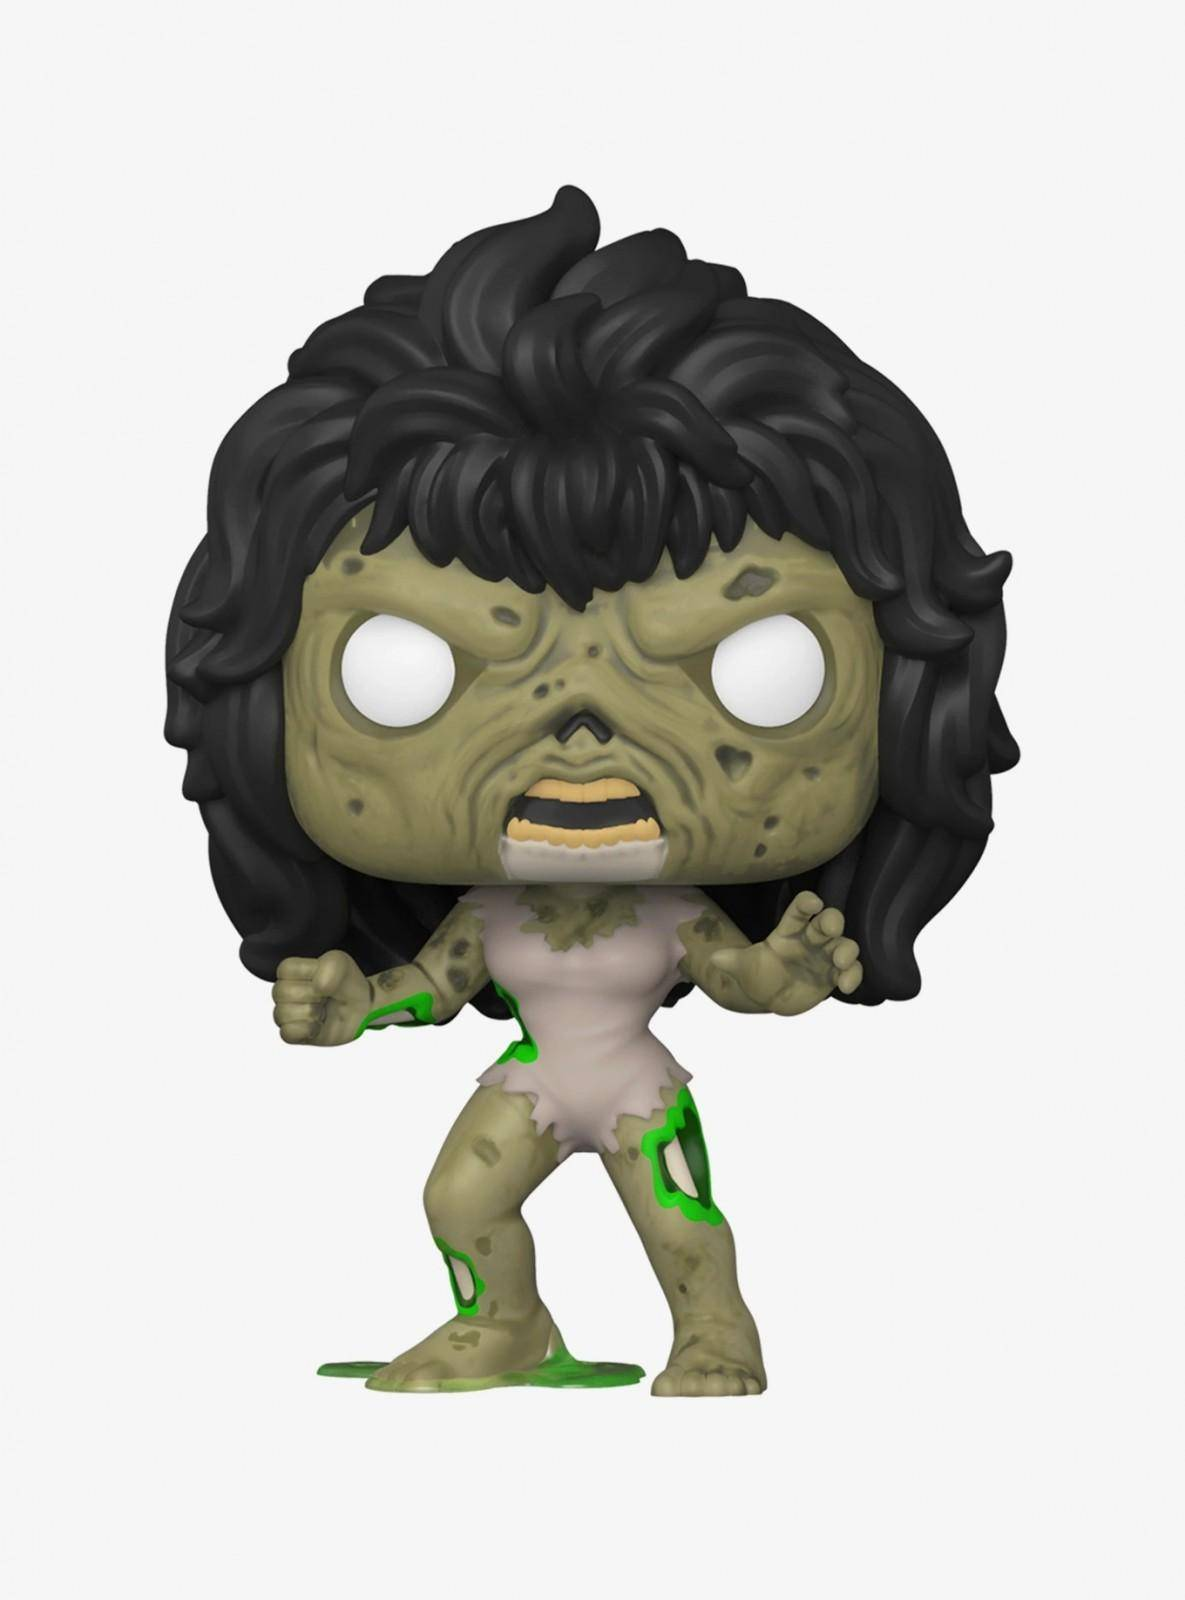 Marvel Zombie She-Hulk Funko Pop